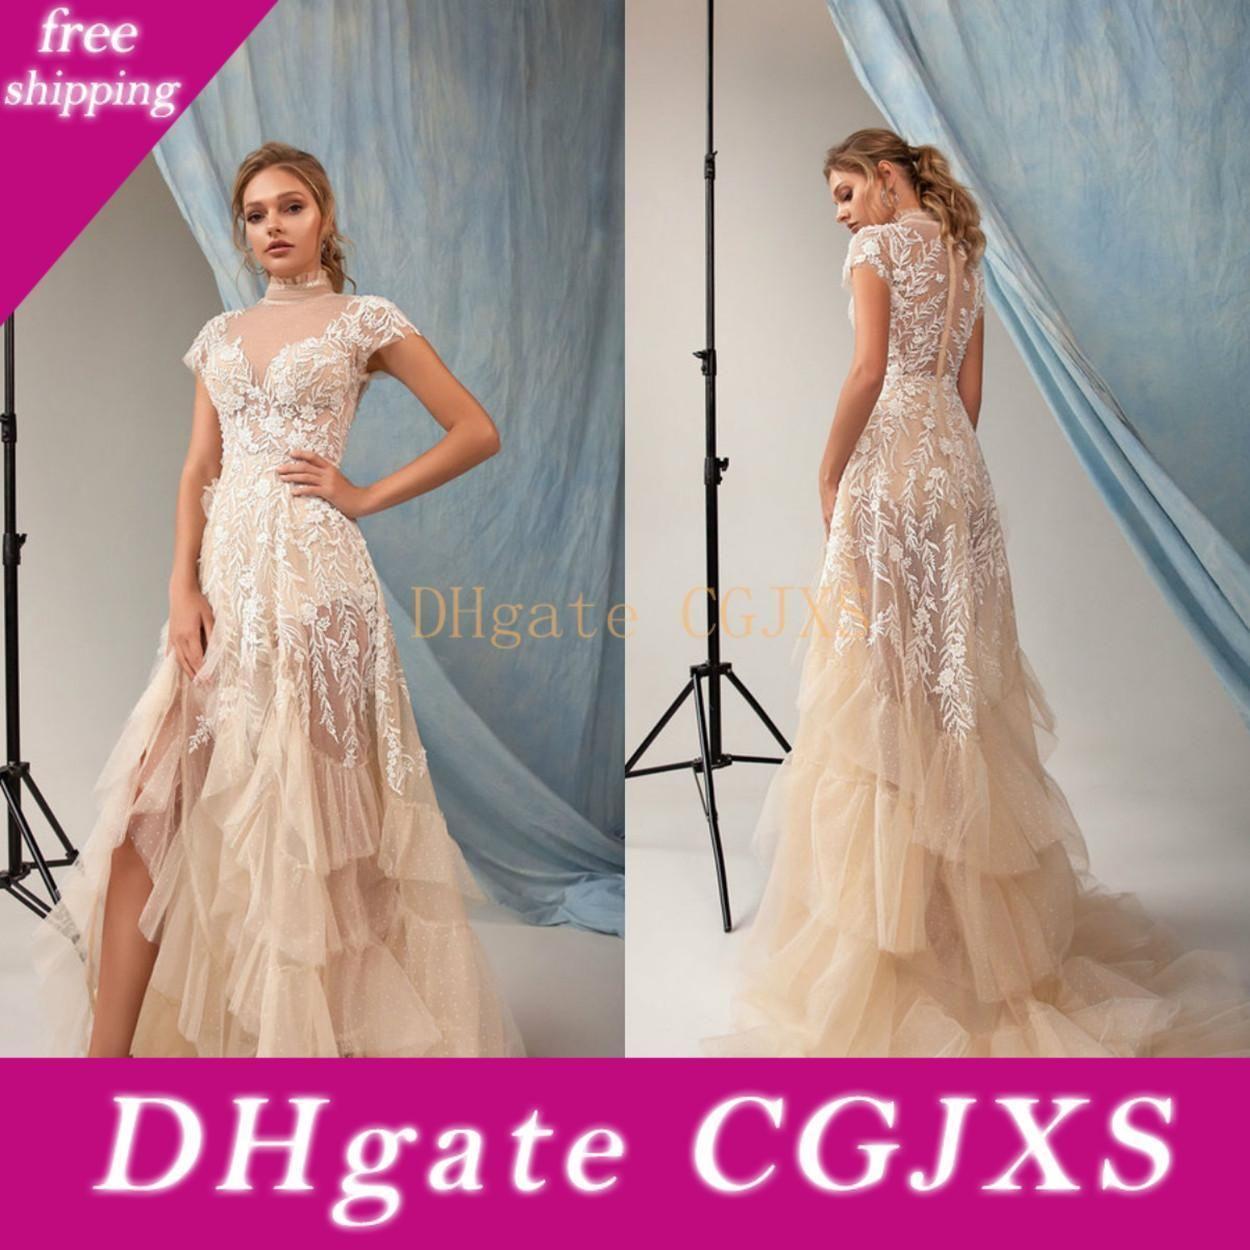 Eva Lendel Wedding Dresses High Collar Short Sleeve Lace Appliques Beads Bridal Gowns Custom Made Sweep Train A -Line Wedding Dress